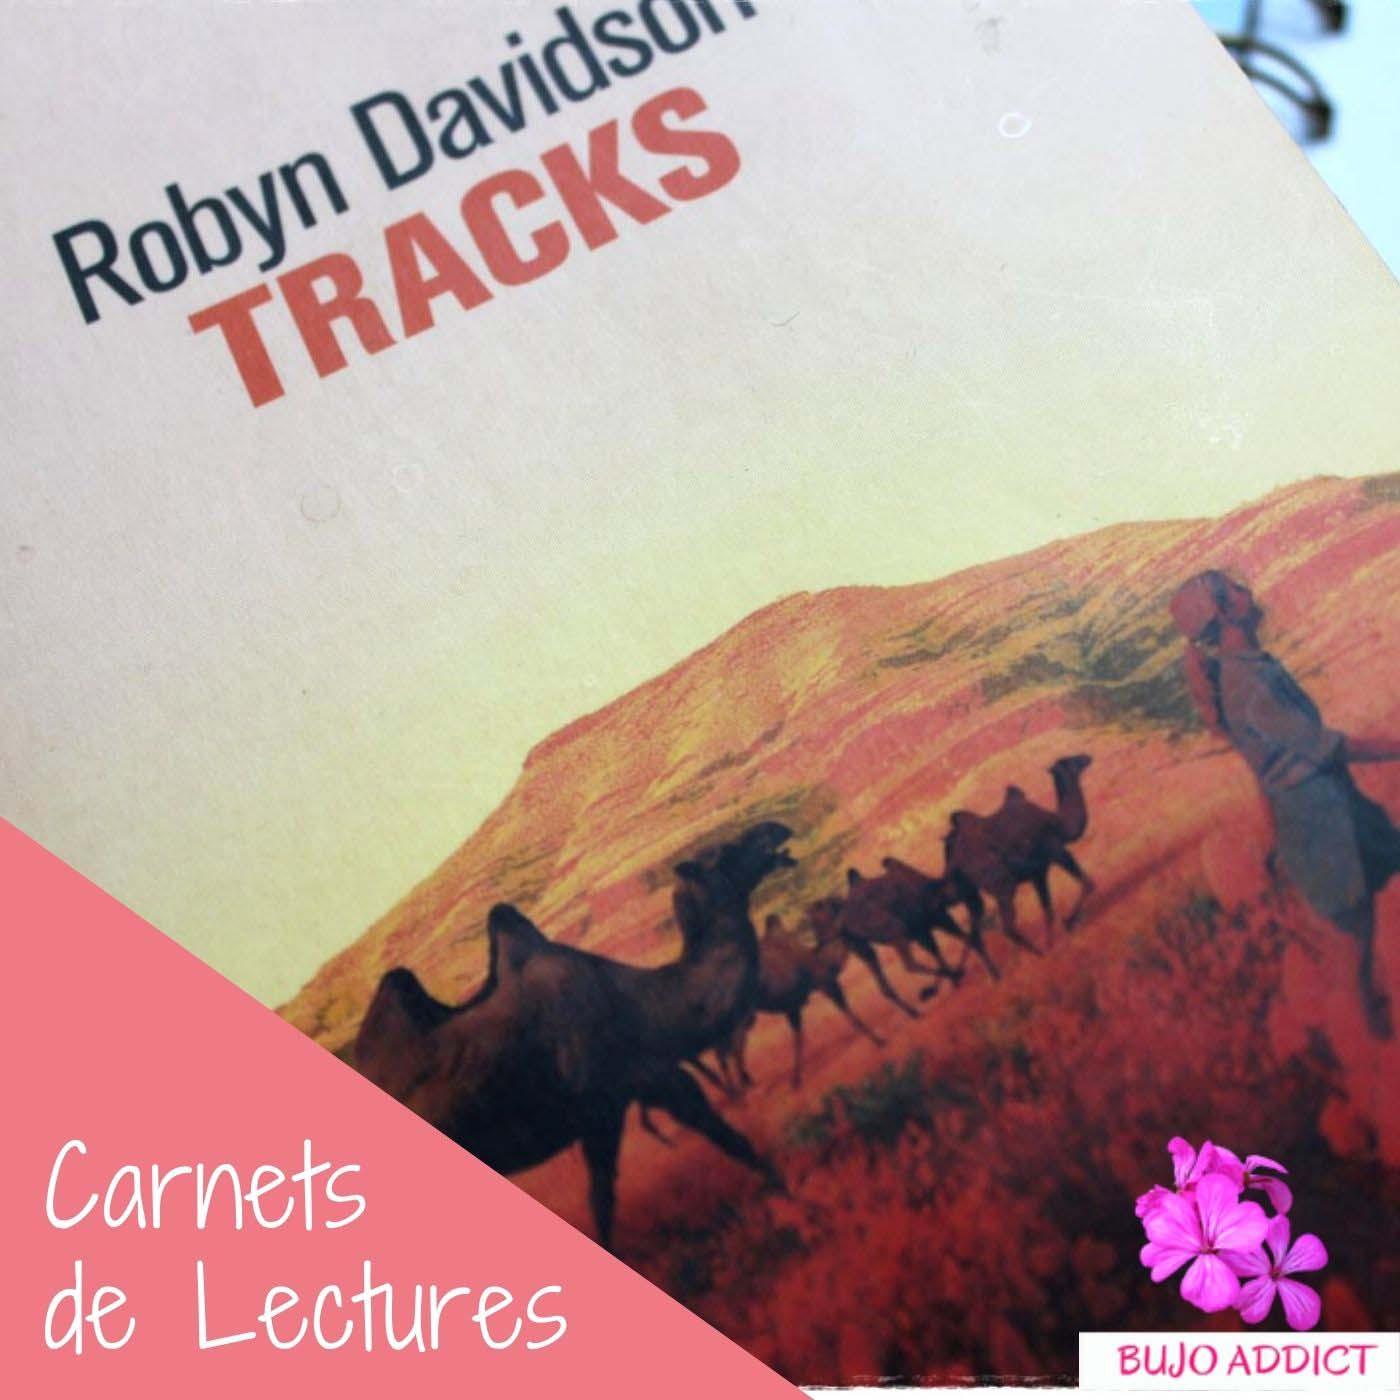 Robyn Davidson - TRACKS